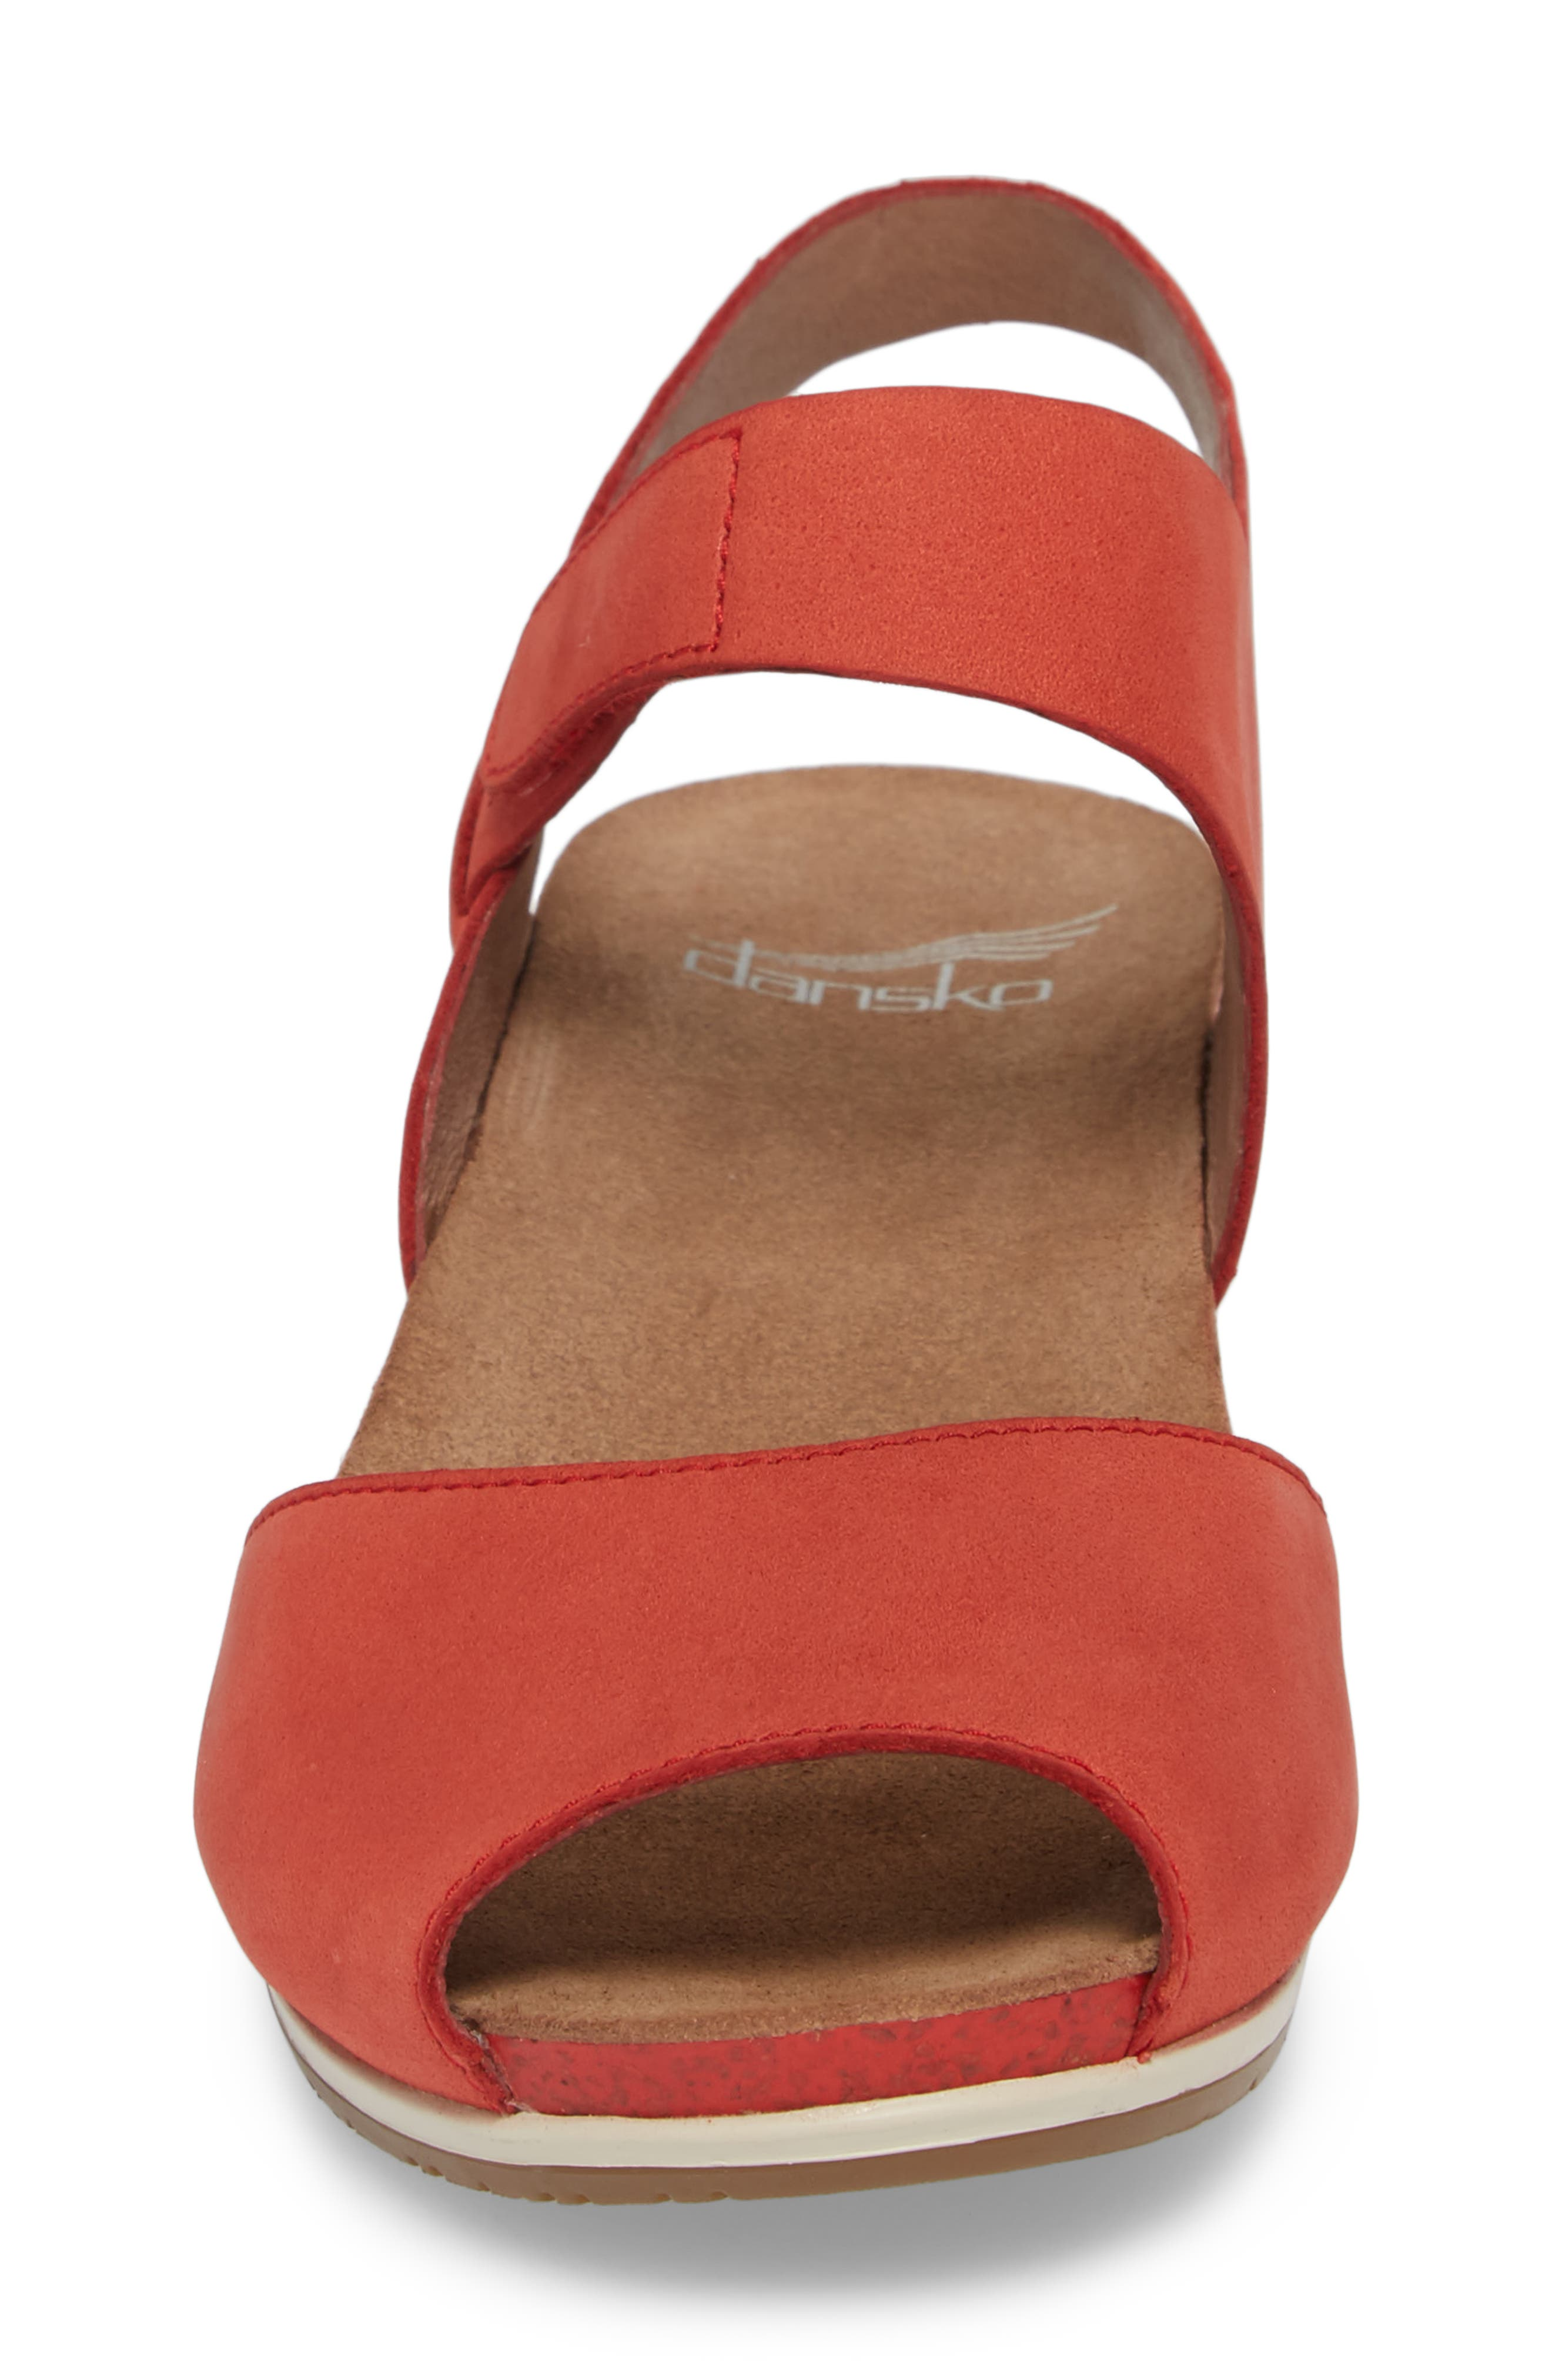 Vera Sandal,                             Alternate thumbnail 4, color,                             Tomato Milled Nubuck Leather